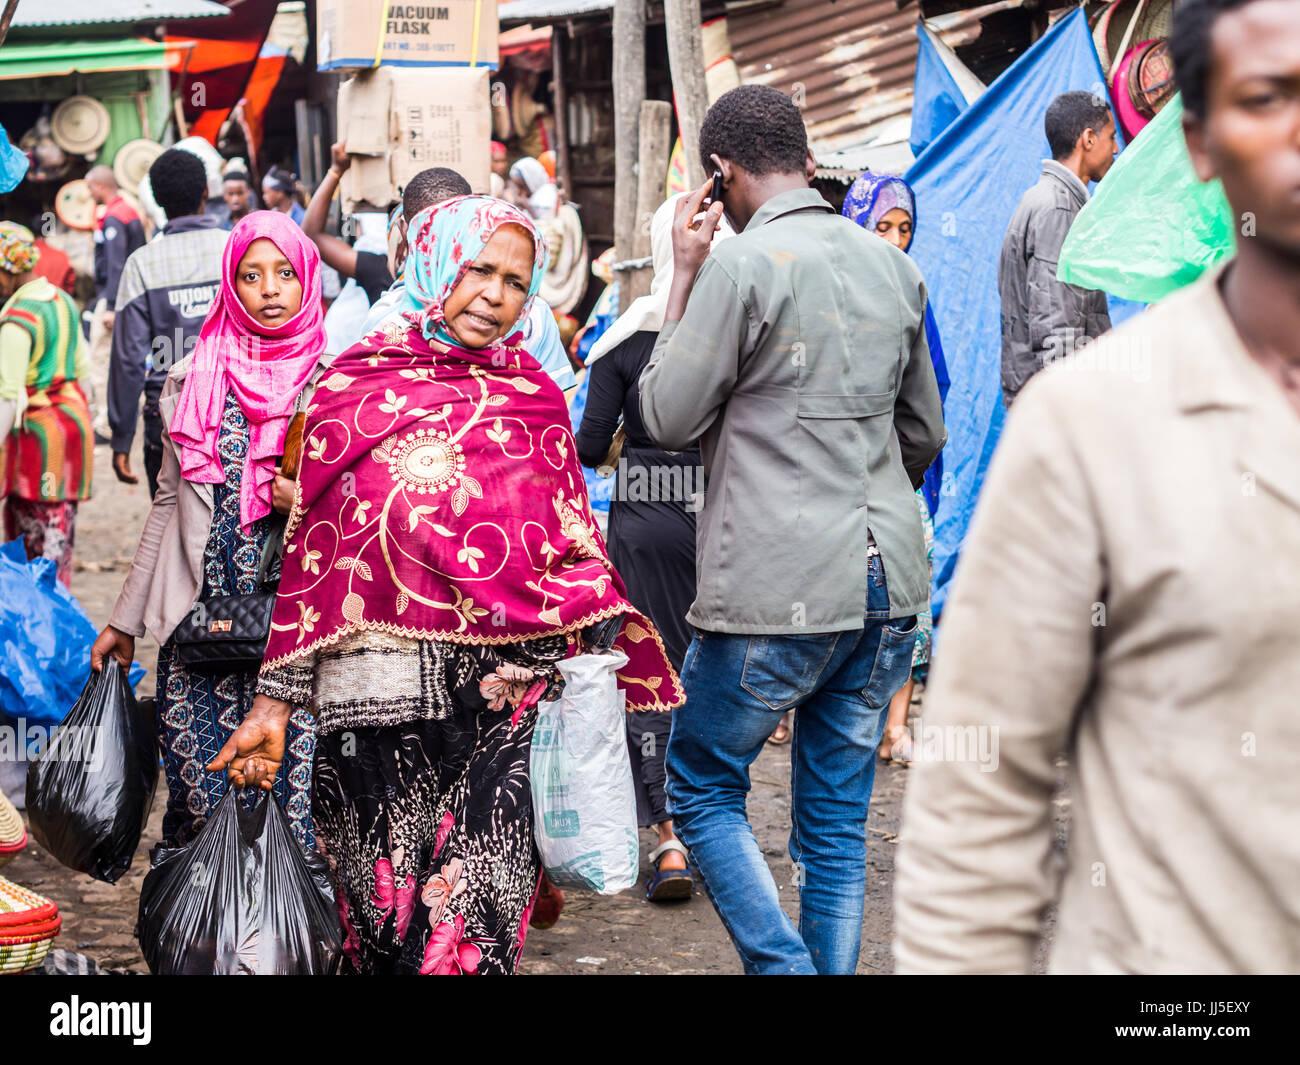 ADDIS ABEBA, ETHIOPIA - JUNE 06, 2016: People at Addis Mercato in Addis Abeba, Ethiopia, the largest market in Africa. - Stock Image